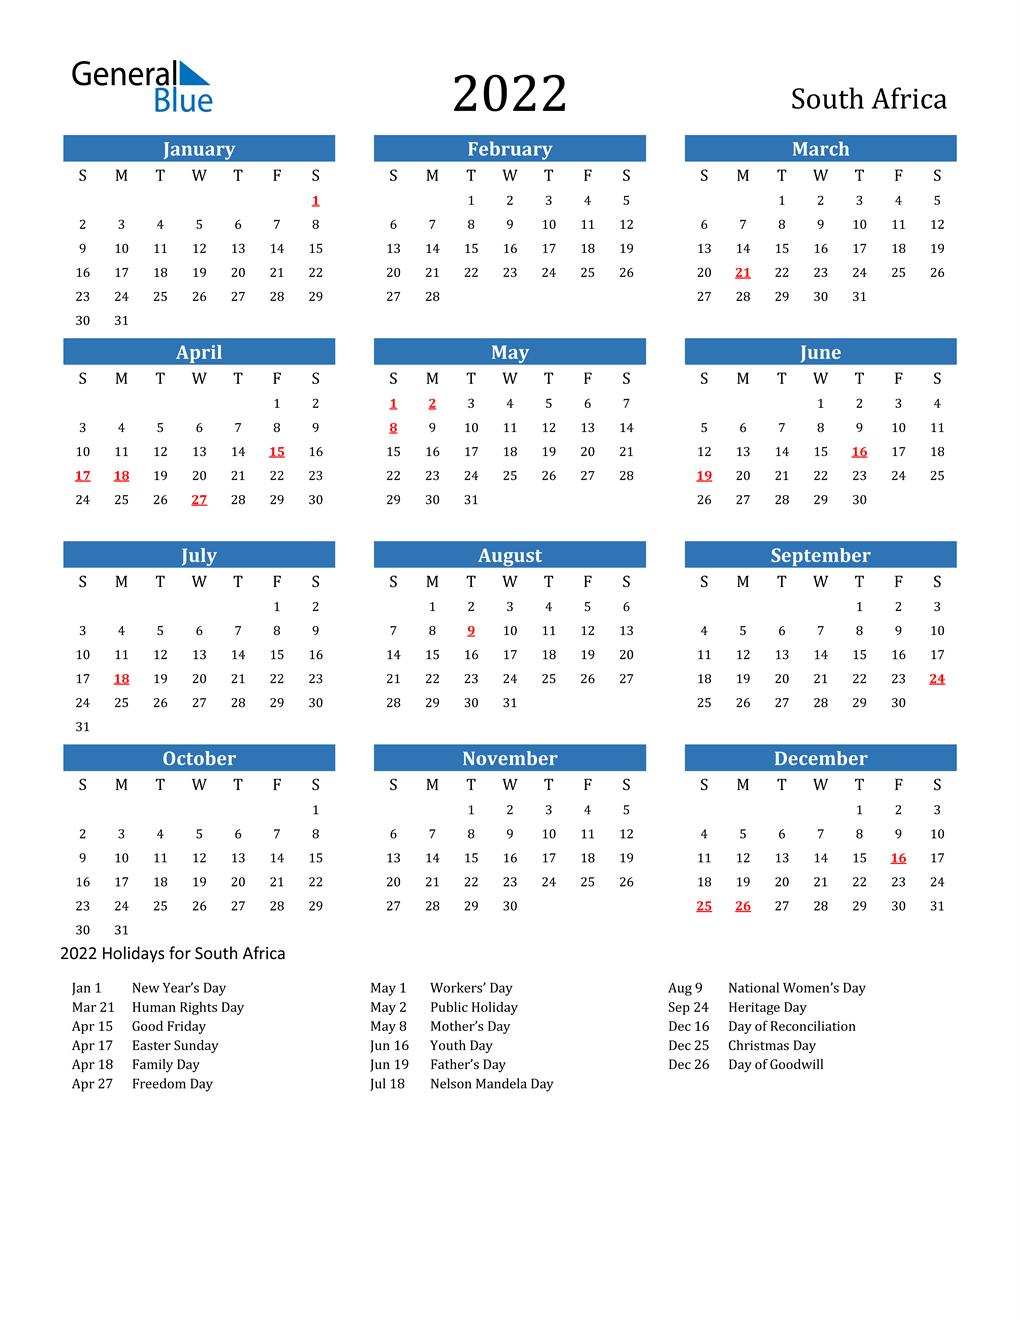 2022 Events Calendar.2022 South Africa Calendar With Holidays